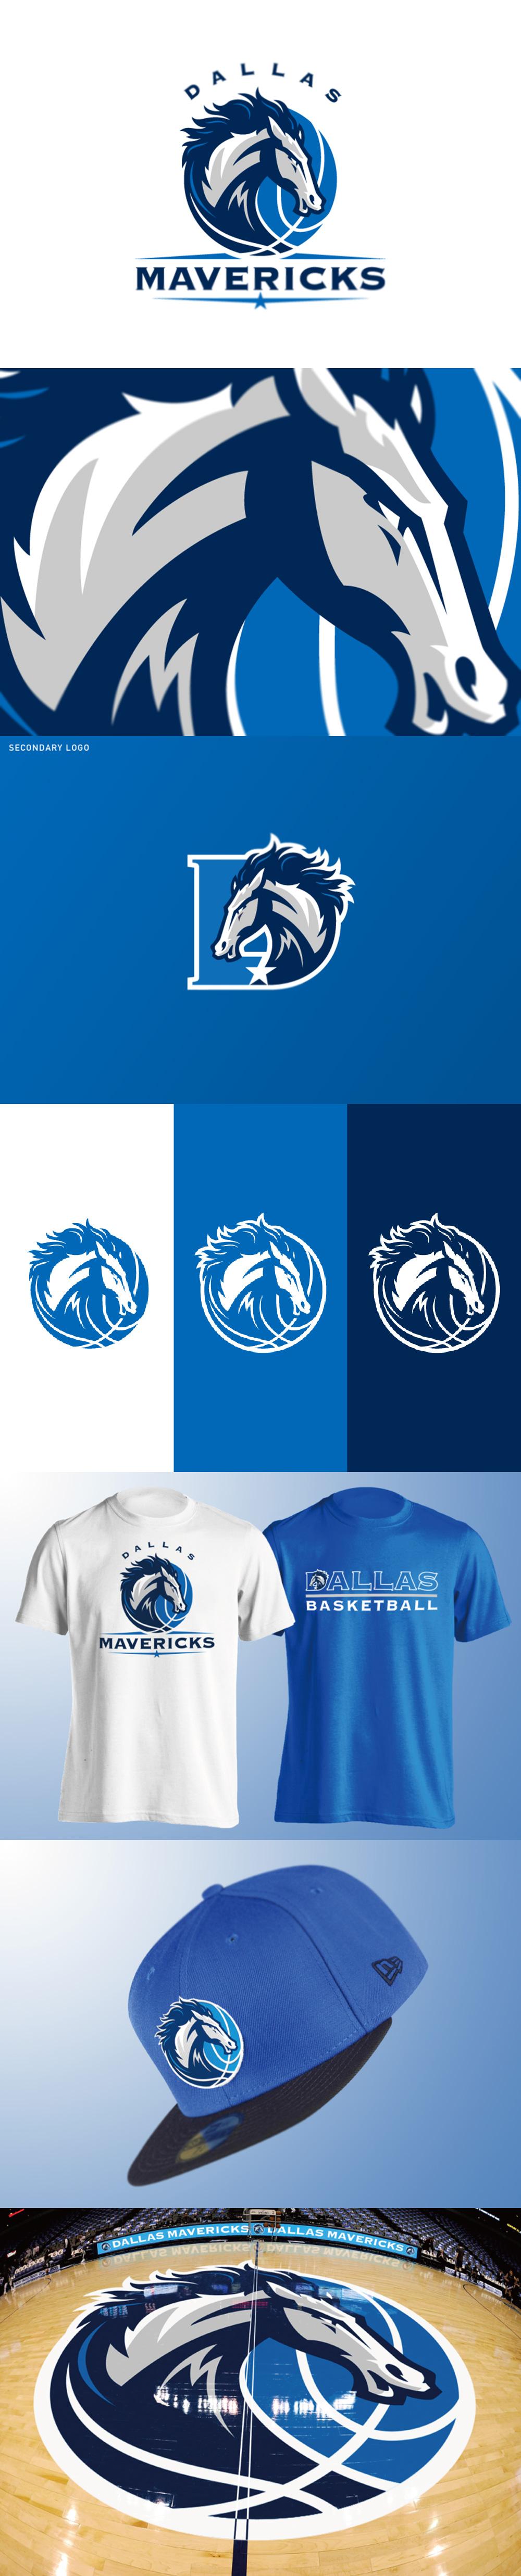 Basketball Team Logo: Dallas Mavericks logo concept by Yu Masuda